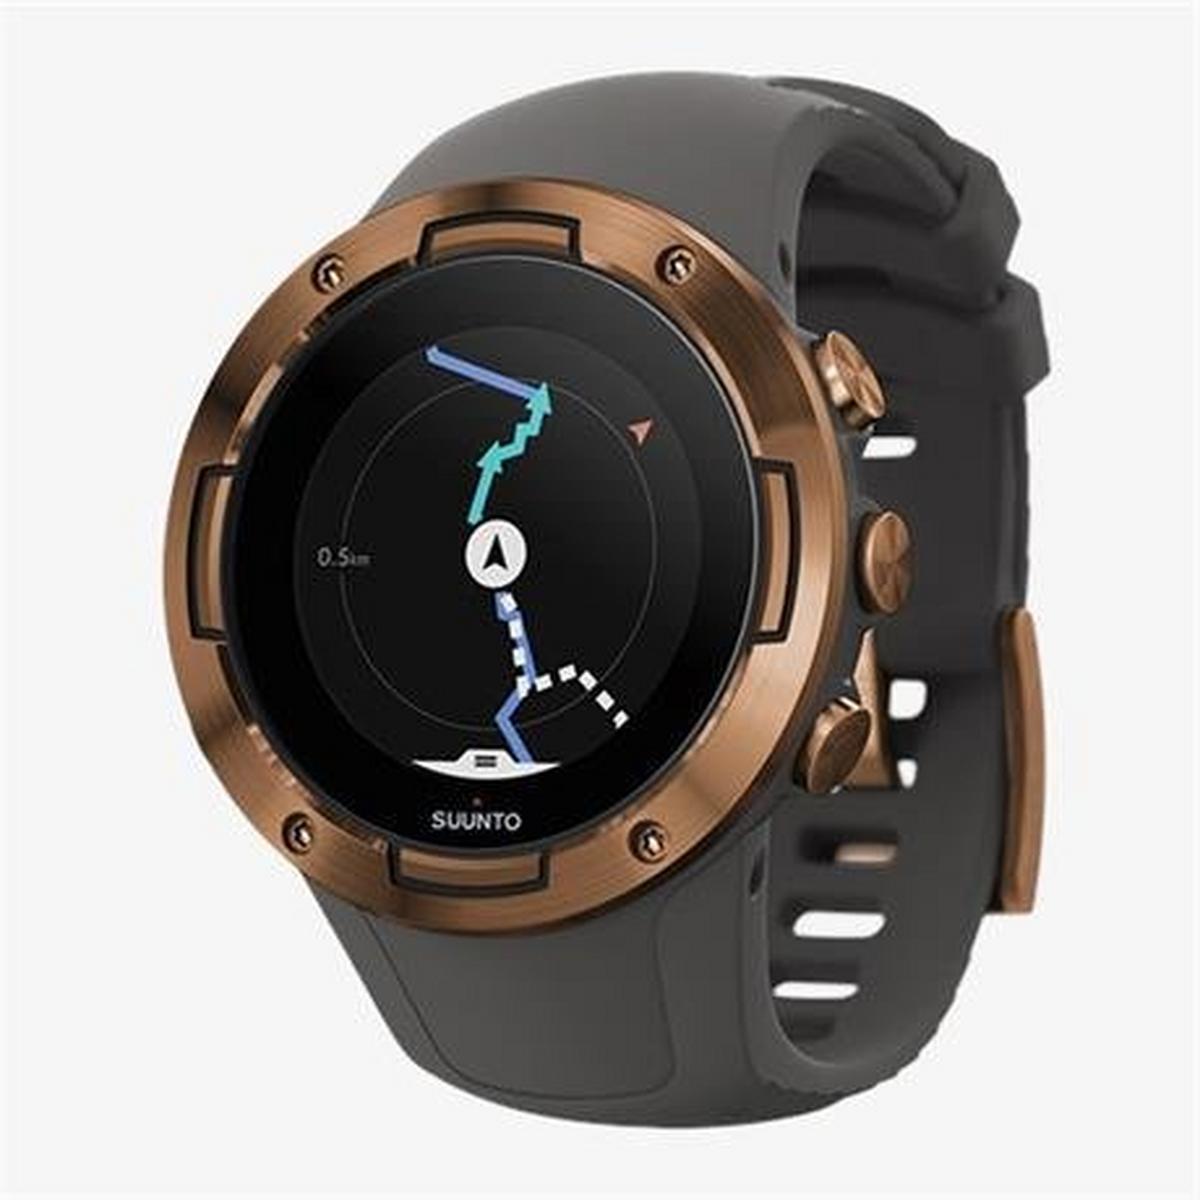 Suunto GPS Watch 5 Graphite Copper Kav